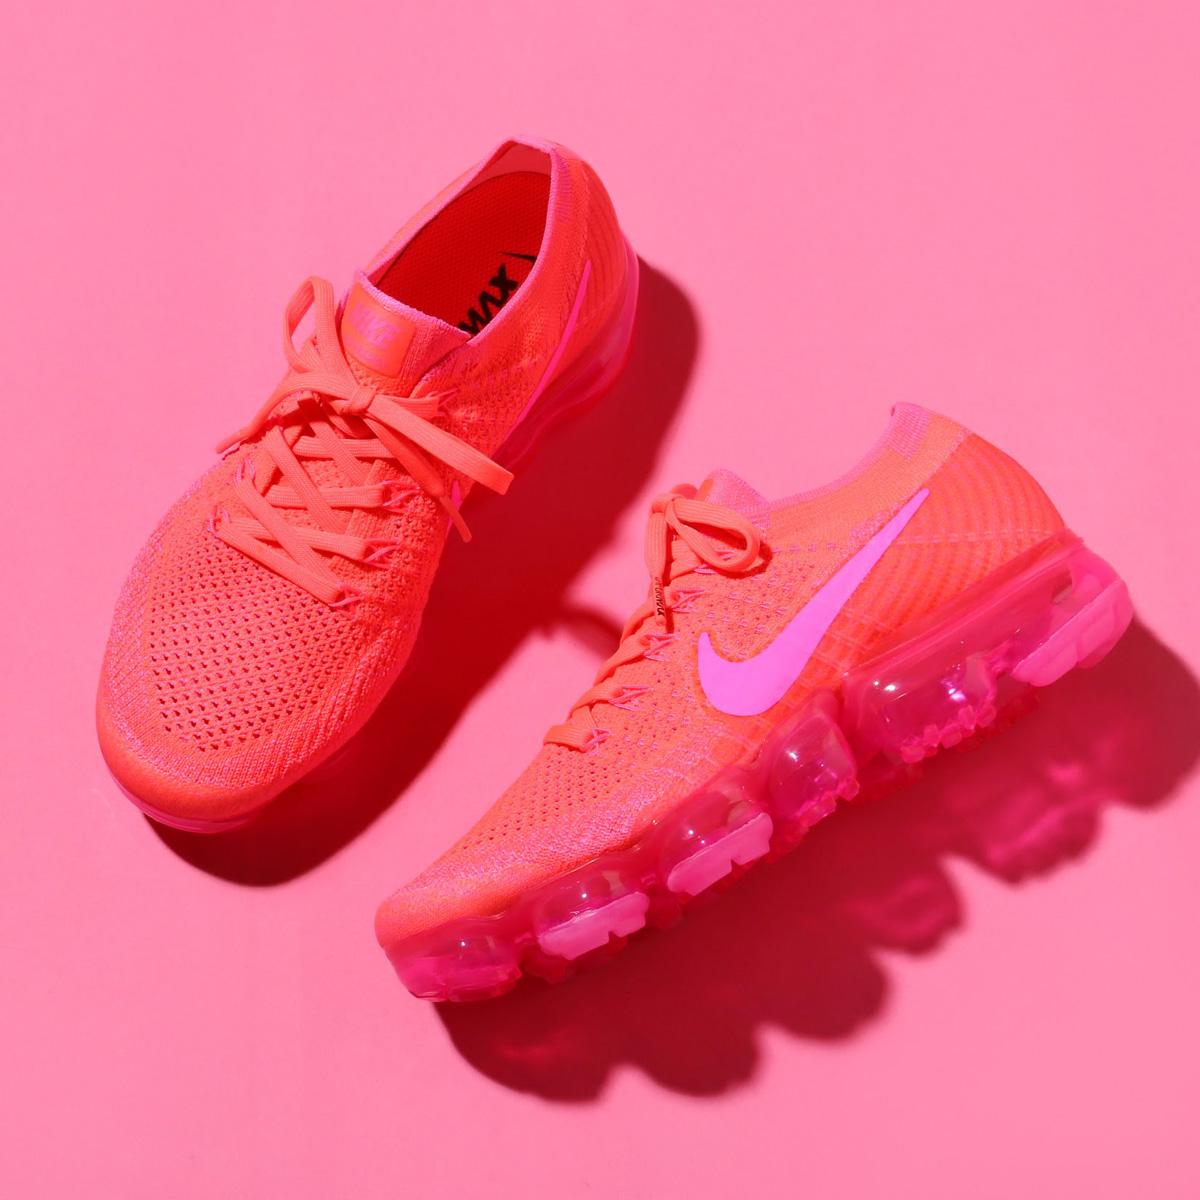 b700033357 atmos pink: NIKE WMNS AIR VAPORMAX FLYKNIT (Nike women air vapor max ...